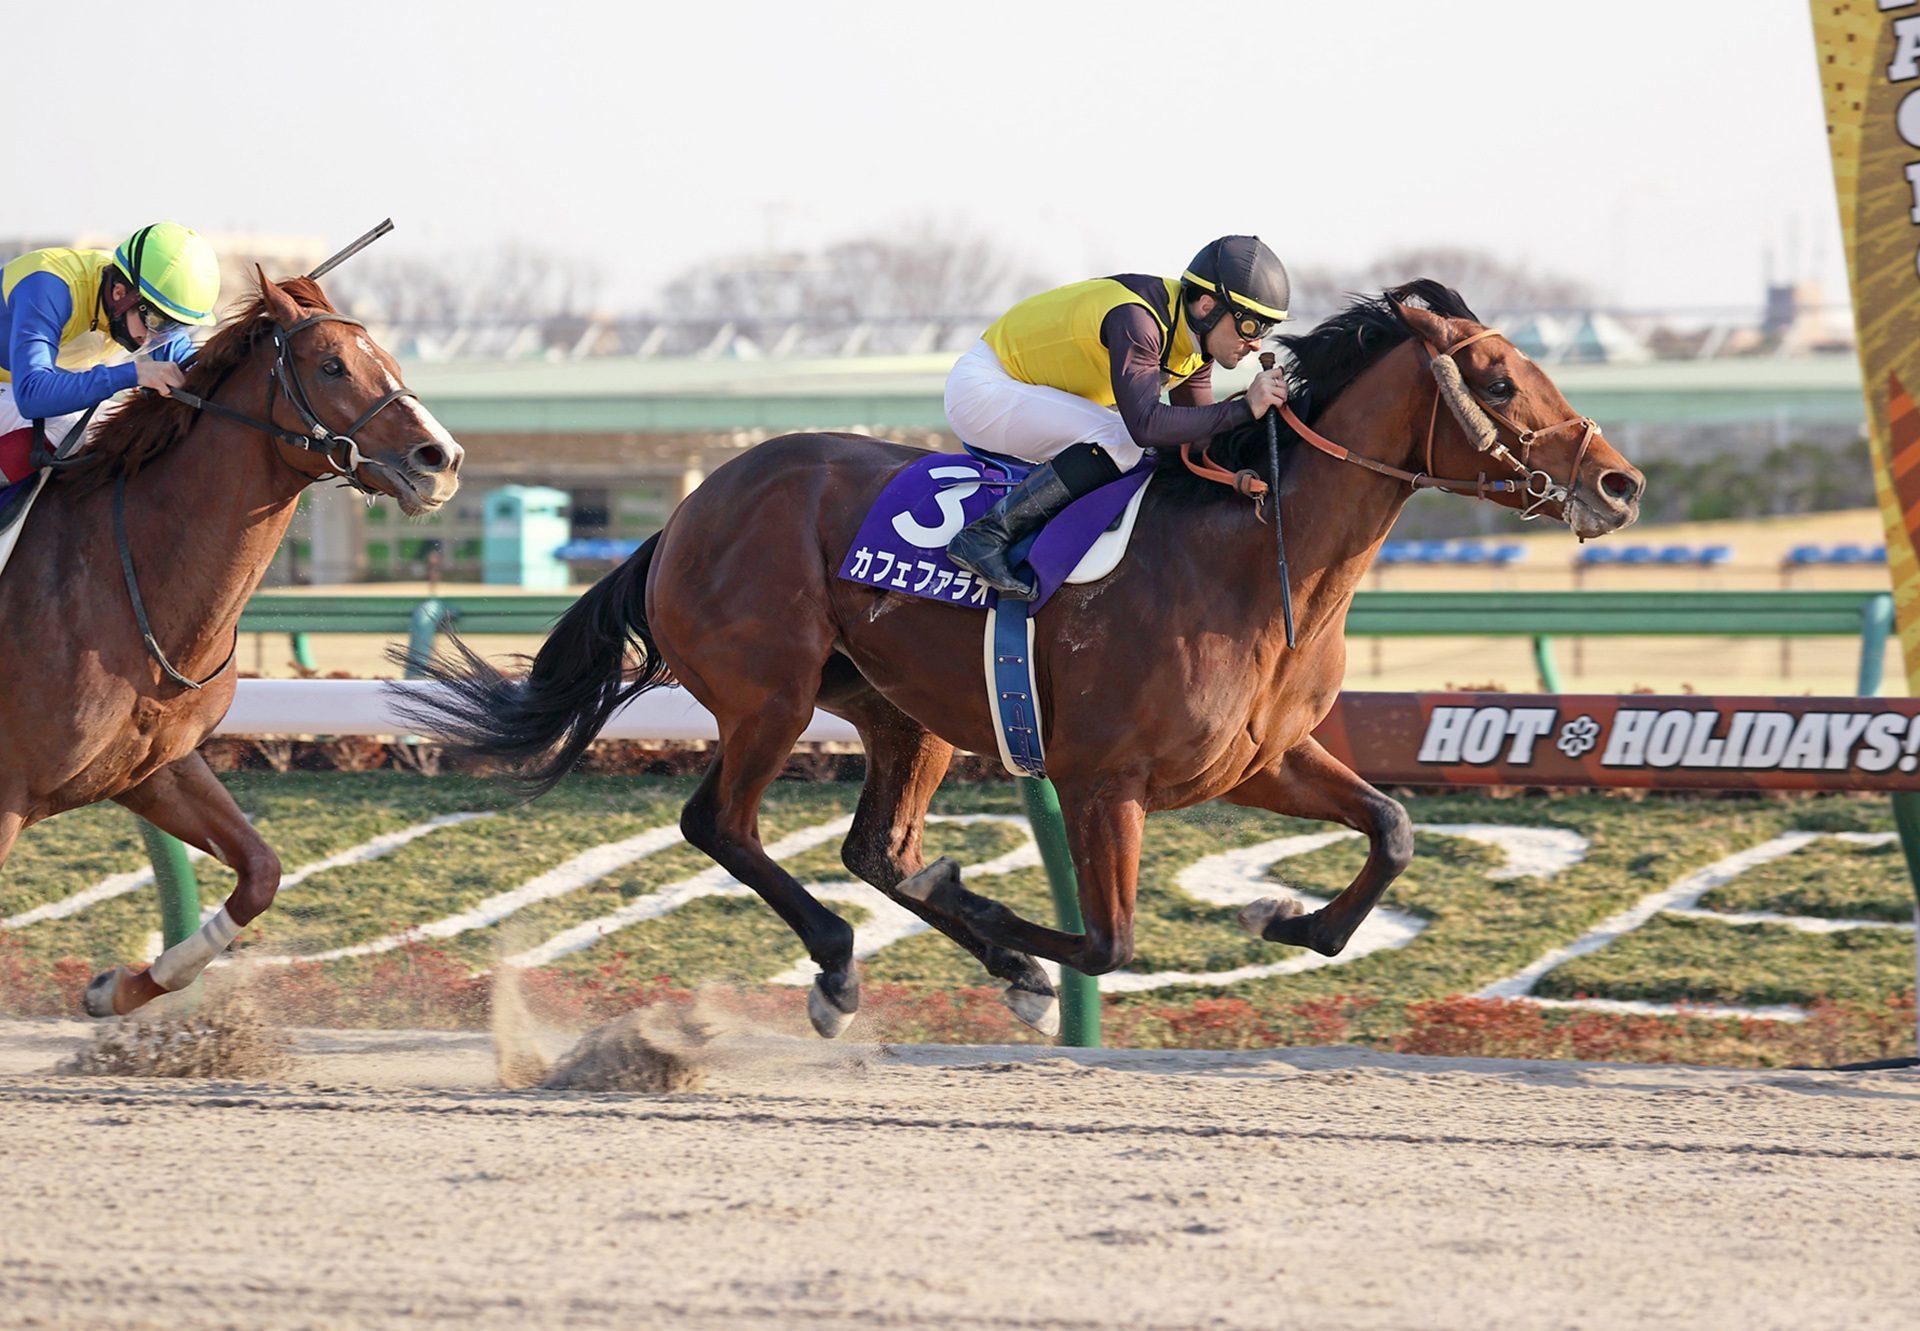 Cafe Pharoah (American Pharoah) wins the Gr.1 February Stakes in Japan